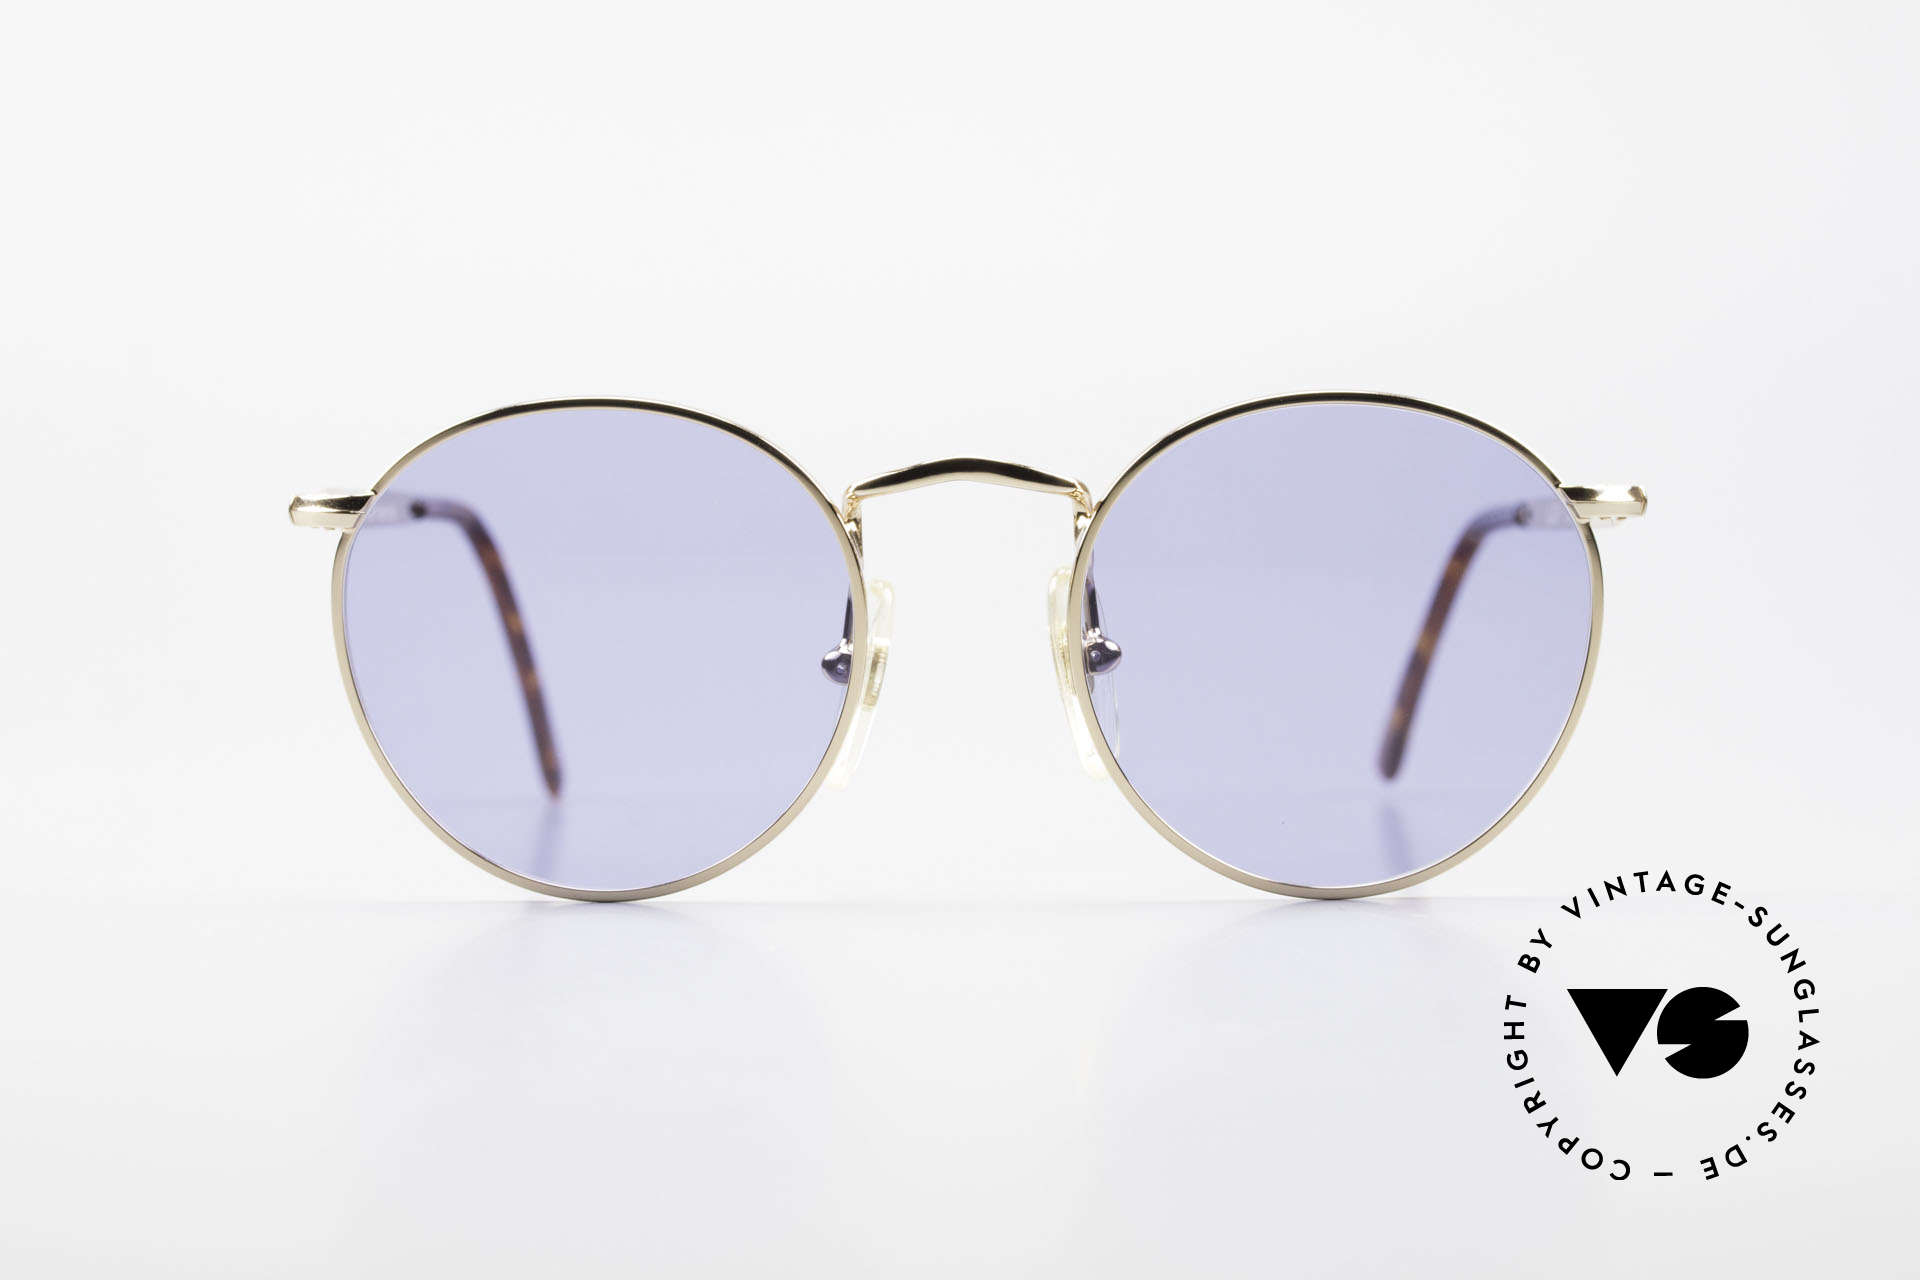 John Lennon - The Dreamer Extra Small Vintage Shades, vintage glasses of the original 'John Lennon Collection', Made for Men and Women